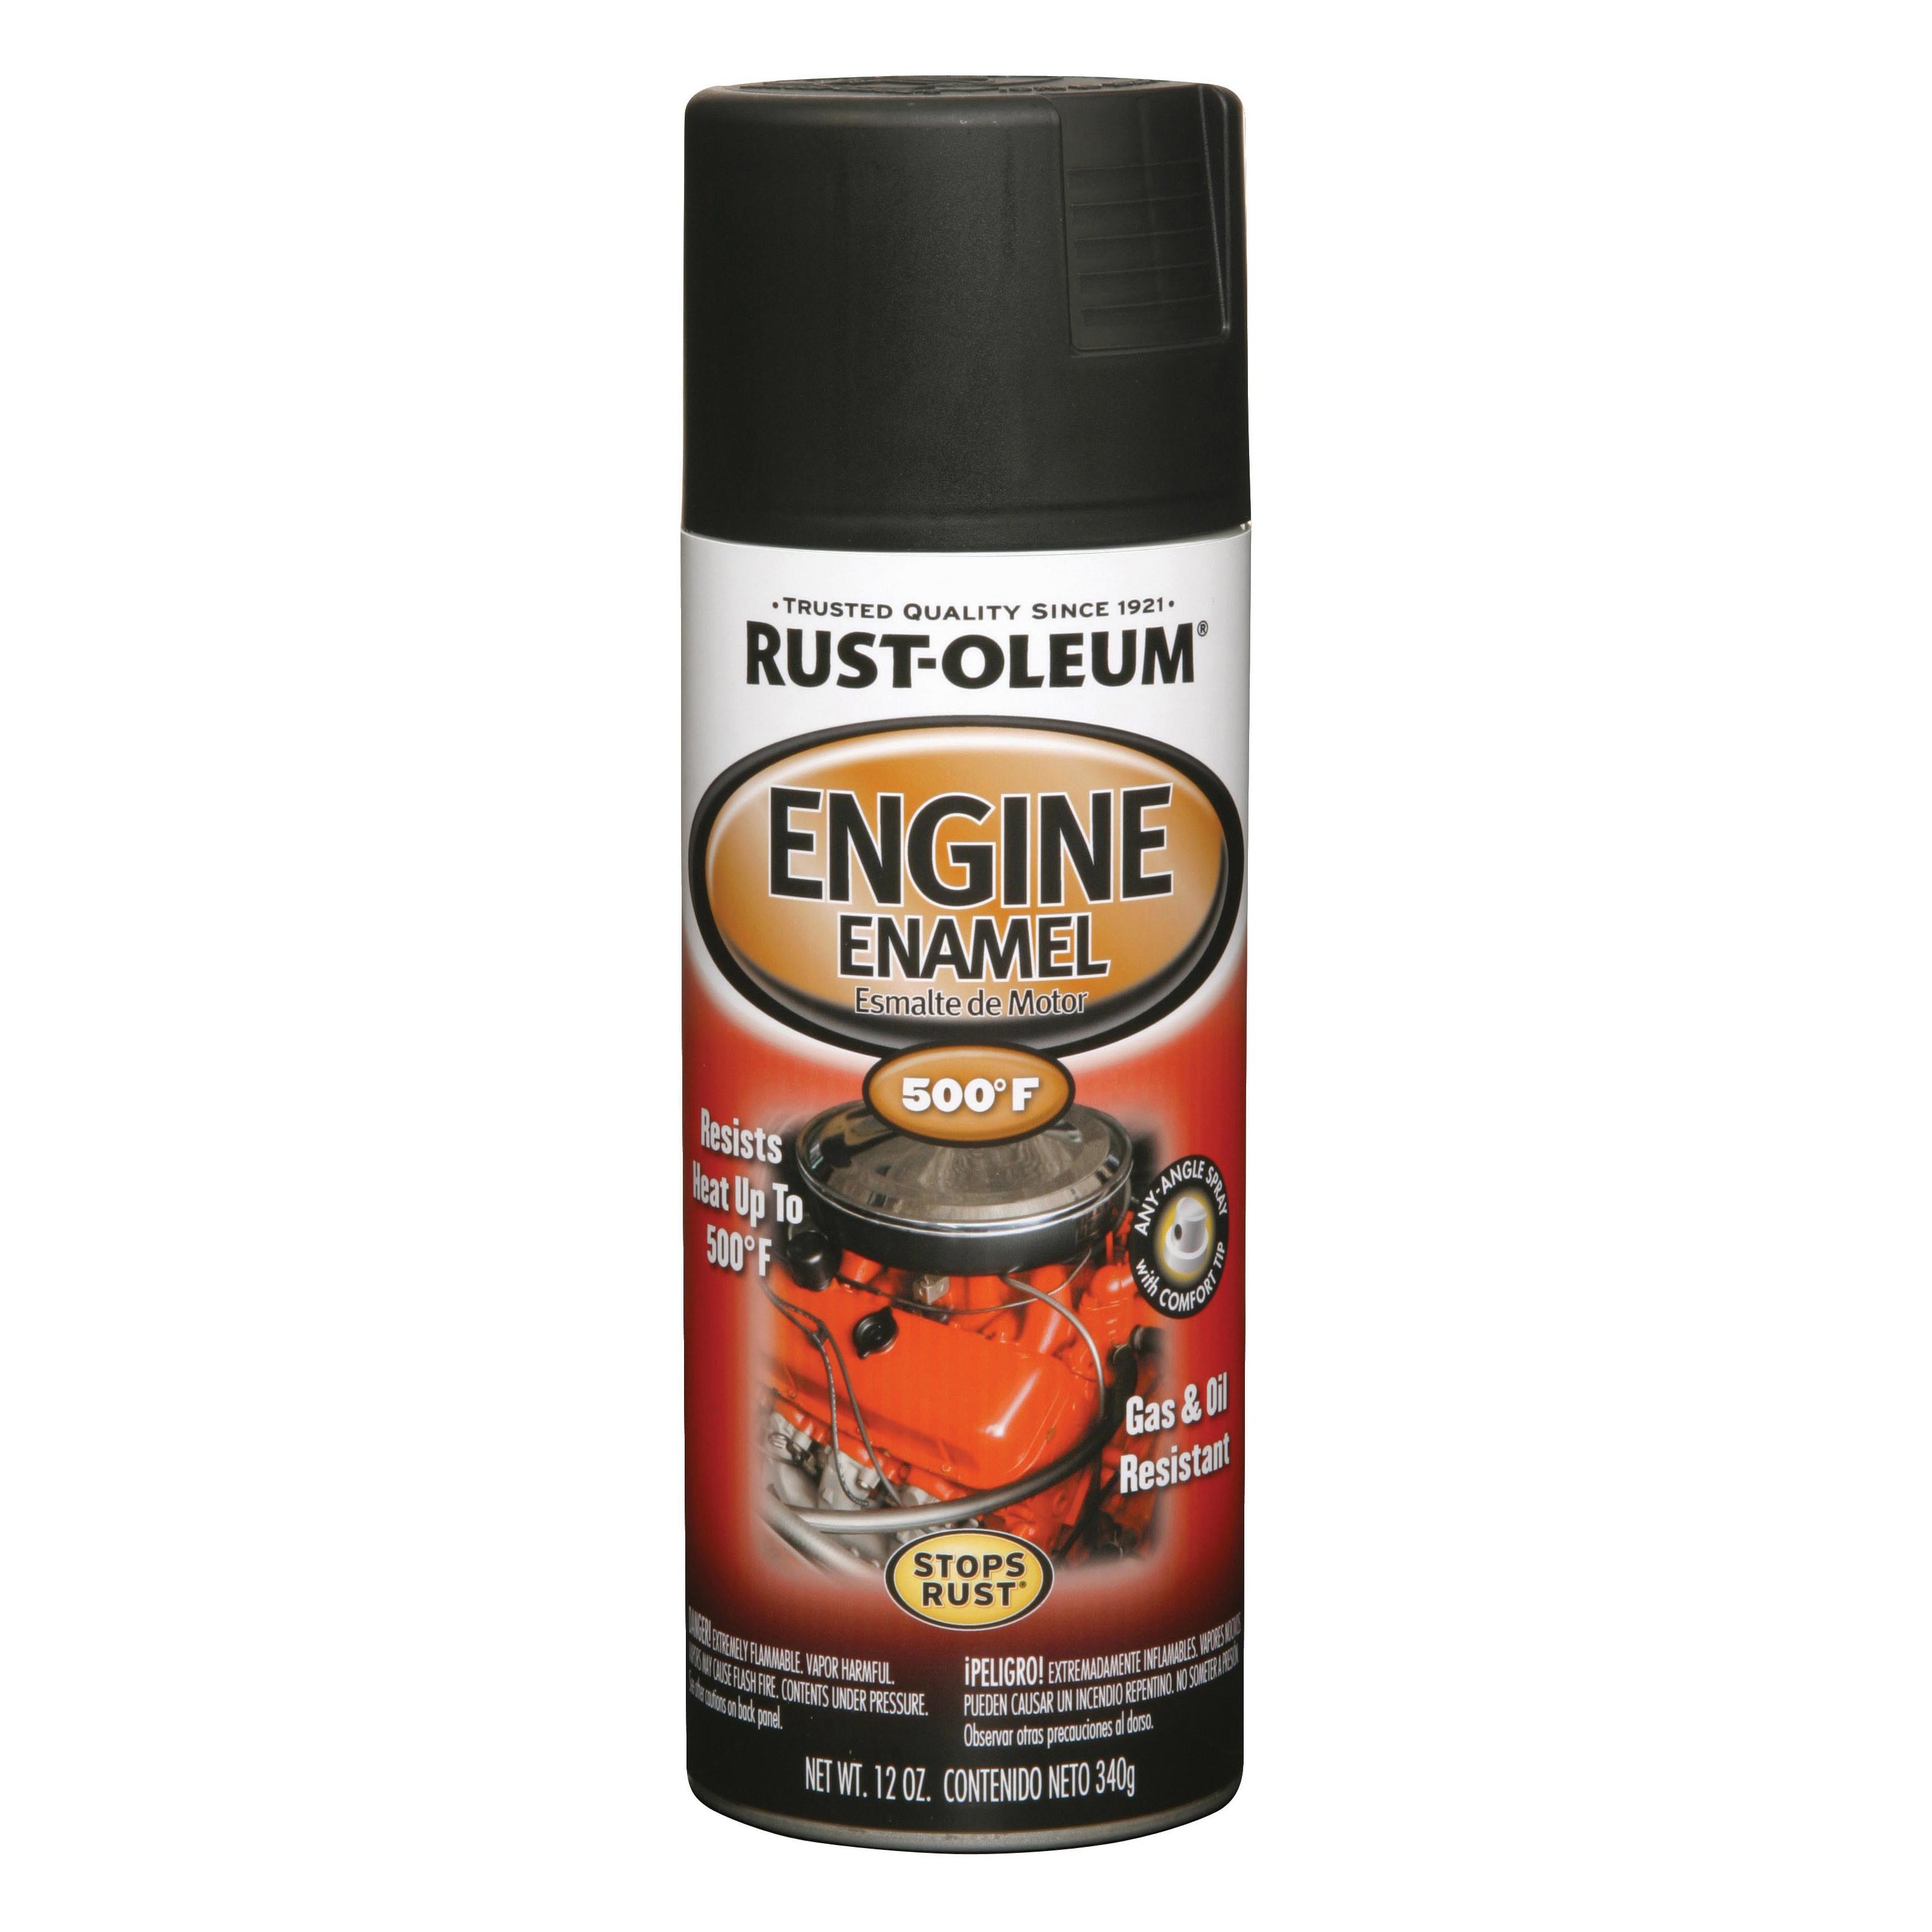 Picture of RUST-OLEUM AUTOMOTIVE 248936 Engine Enamel Spray Paint, Black, 12 oz, Aerosol Can